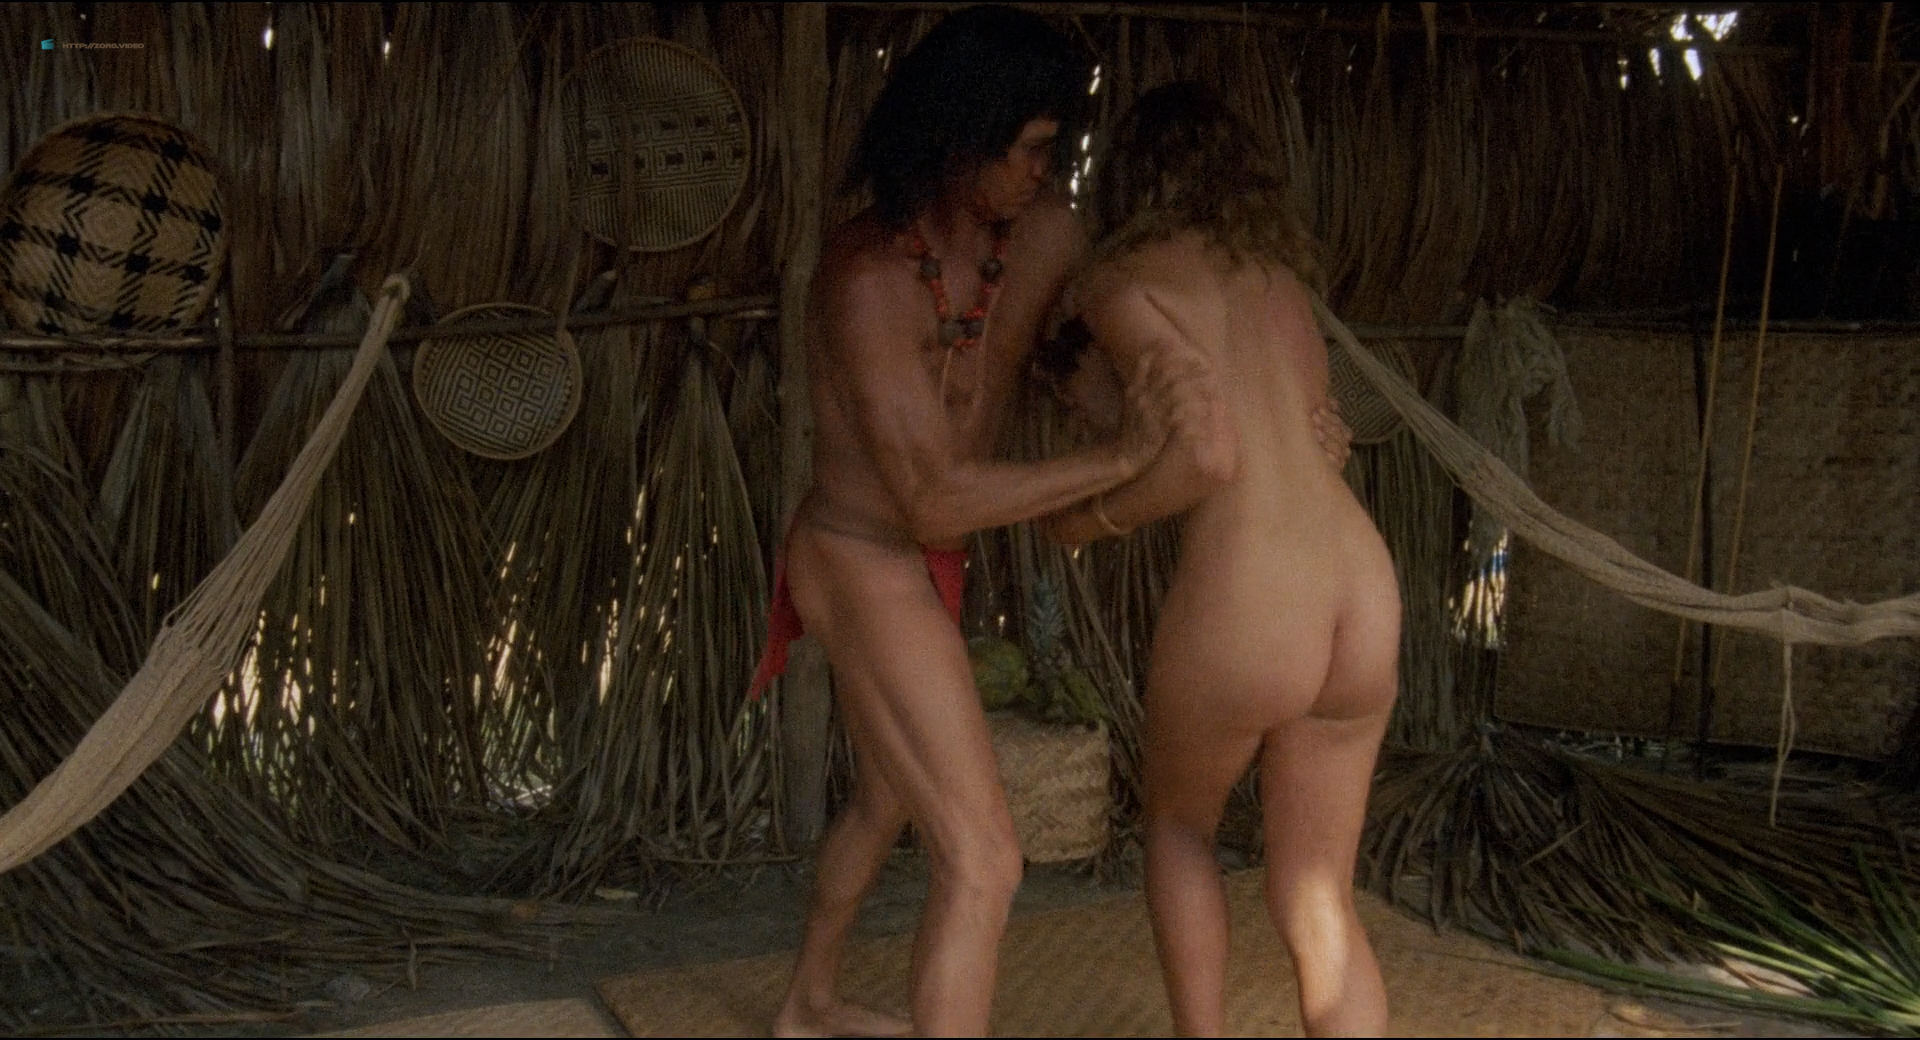 Elvire Audray nude Sara Fleszer, Jessica Bridges all nude full frontal - White Slave (IT-1985) HD 1080p BluRay (14)